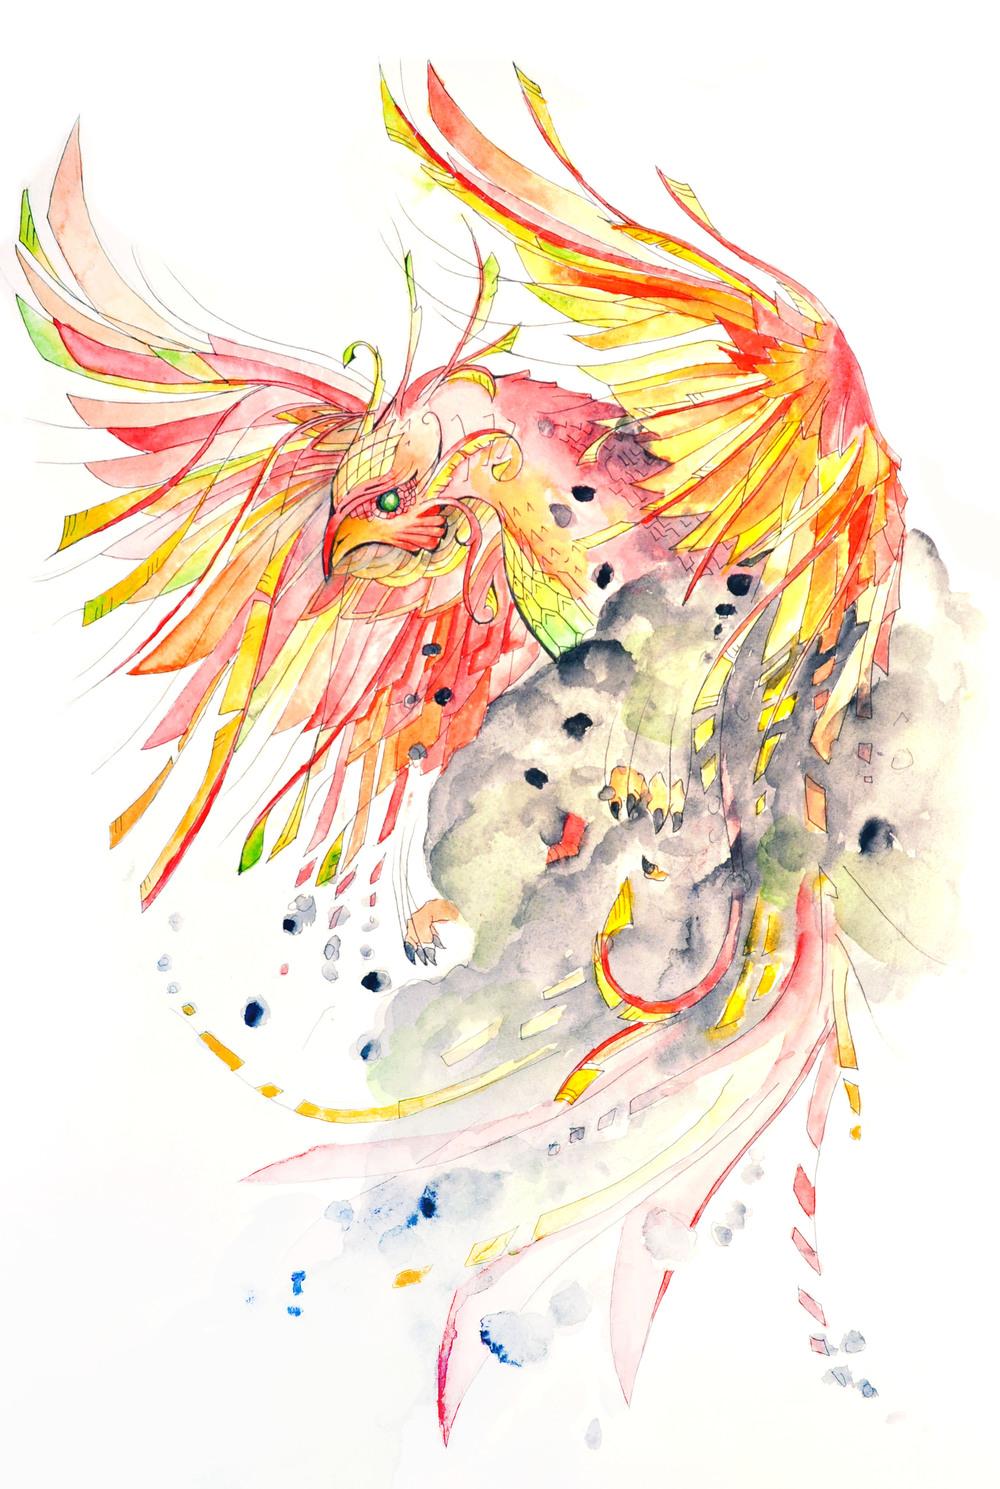 Phoenix Tattoo Design Watercolor on Paper January 2016